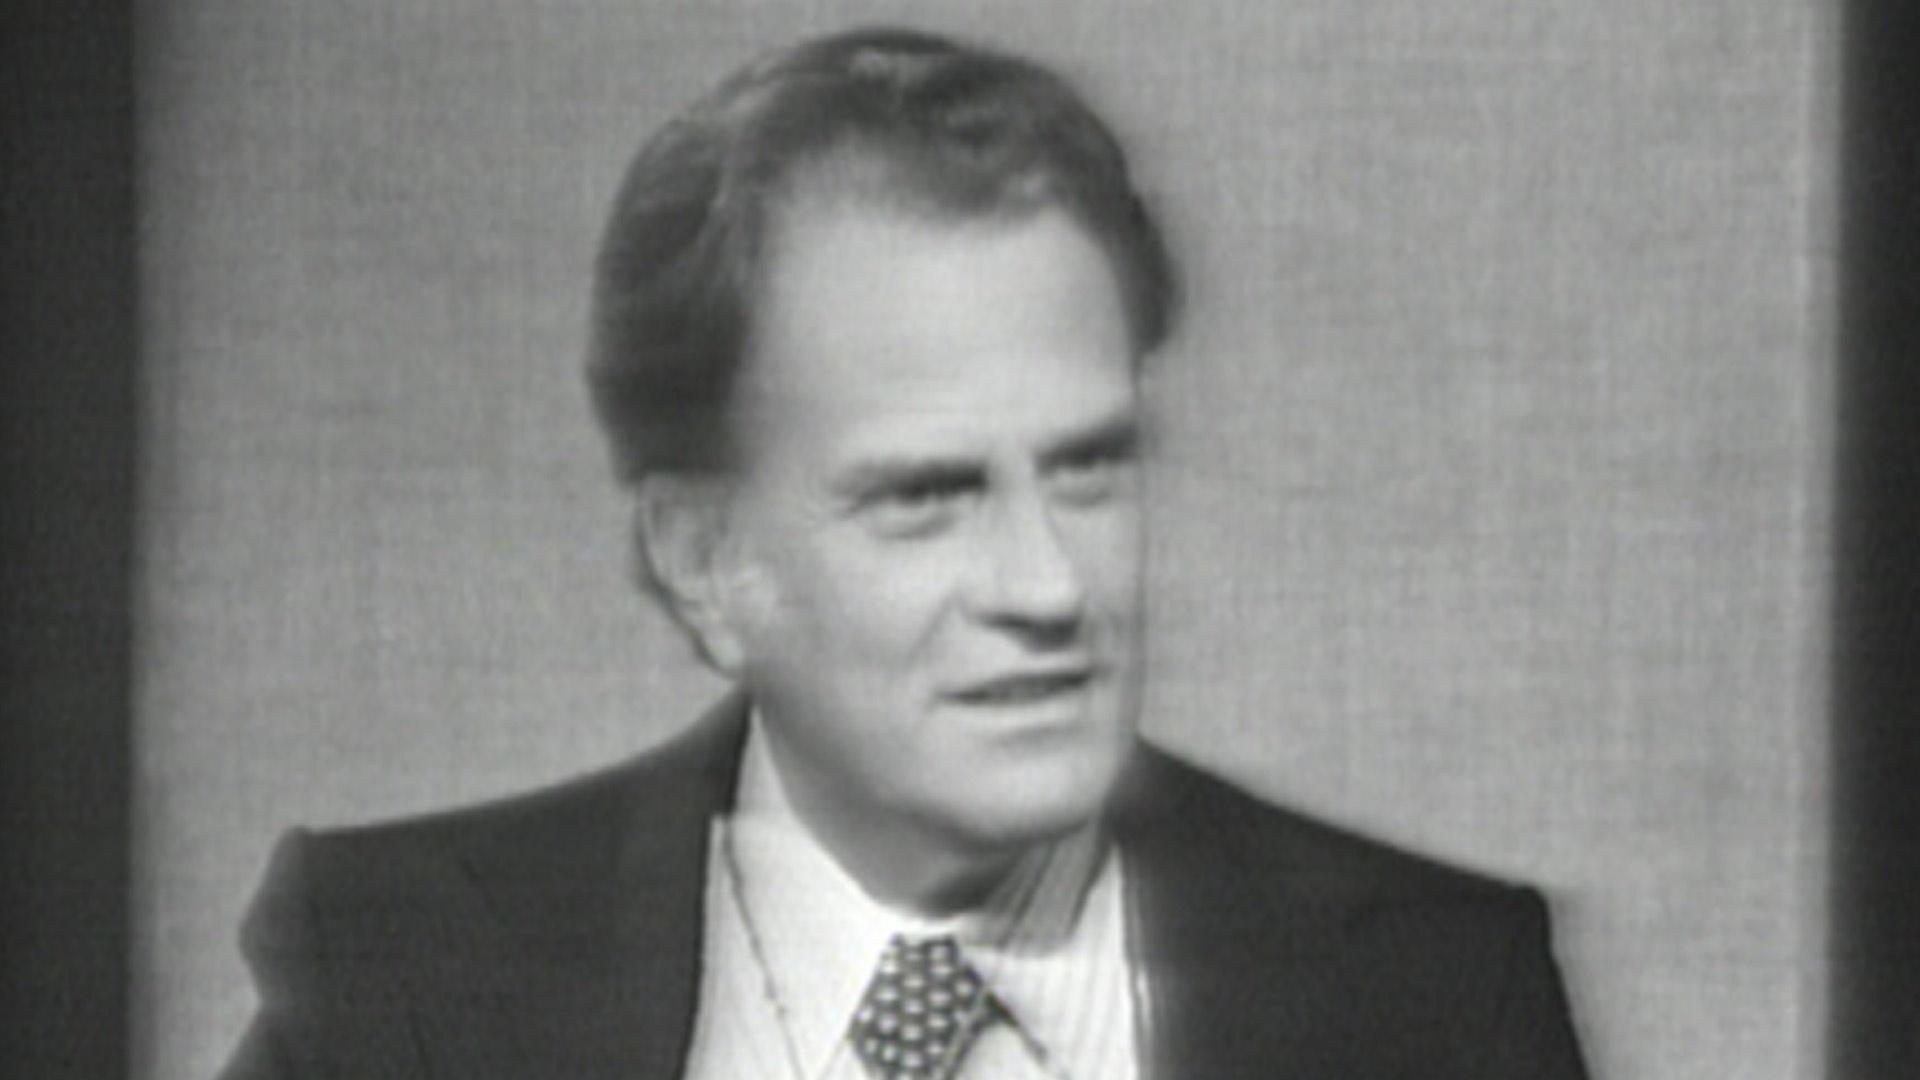 Dr. Billy Graham (1973)